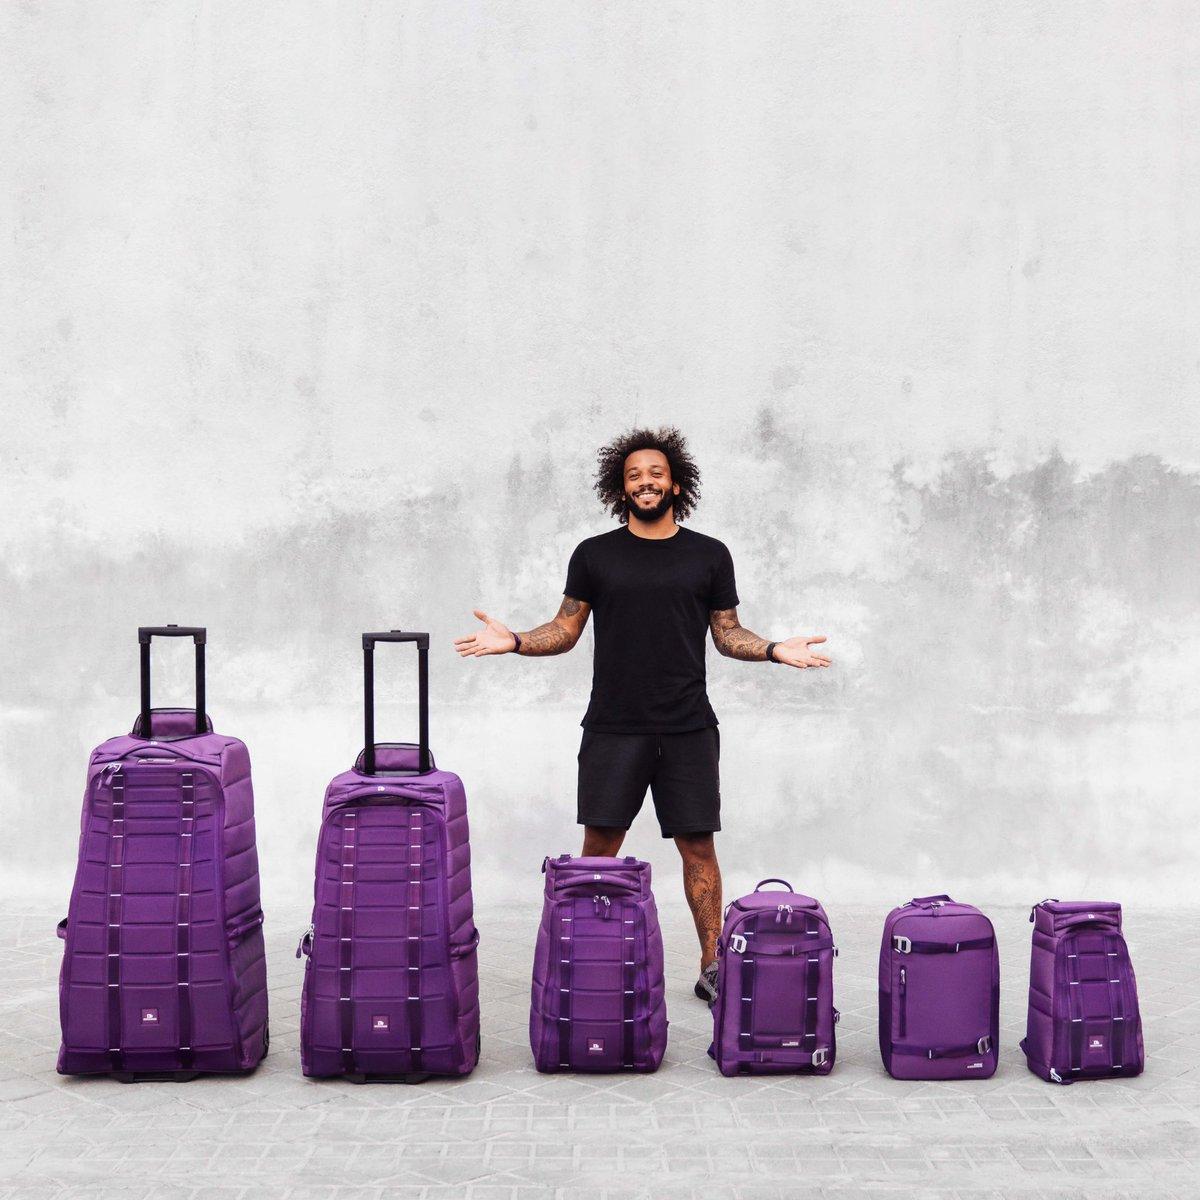 Vieira Purple by @mydouchebag , available now! 🤟🏾💜 disponível já!  https://t.co/uqrymSyHJp https://t.co/cAOMysuzMD